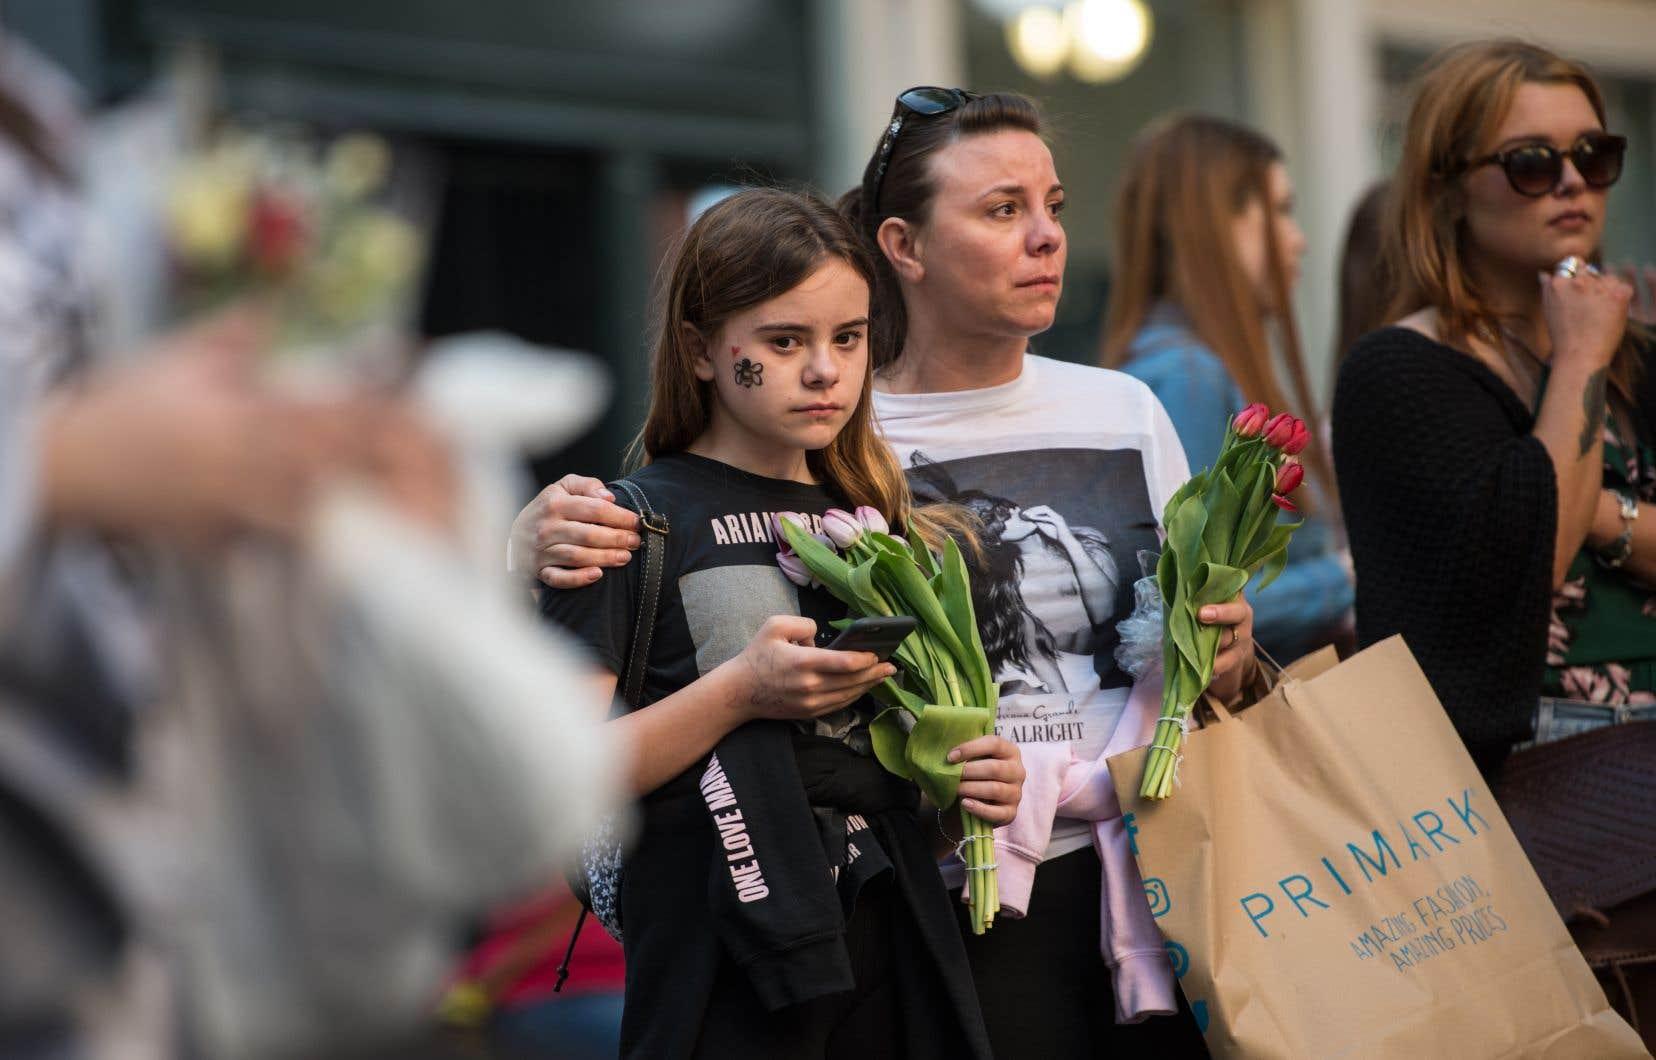 L'attentat a fait 22 victimes.